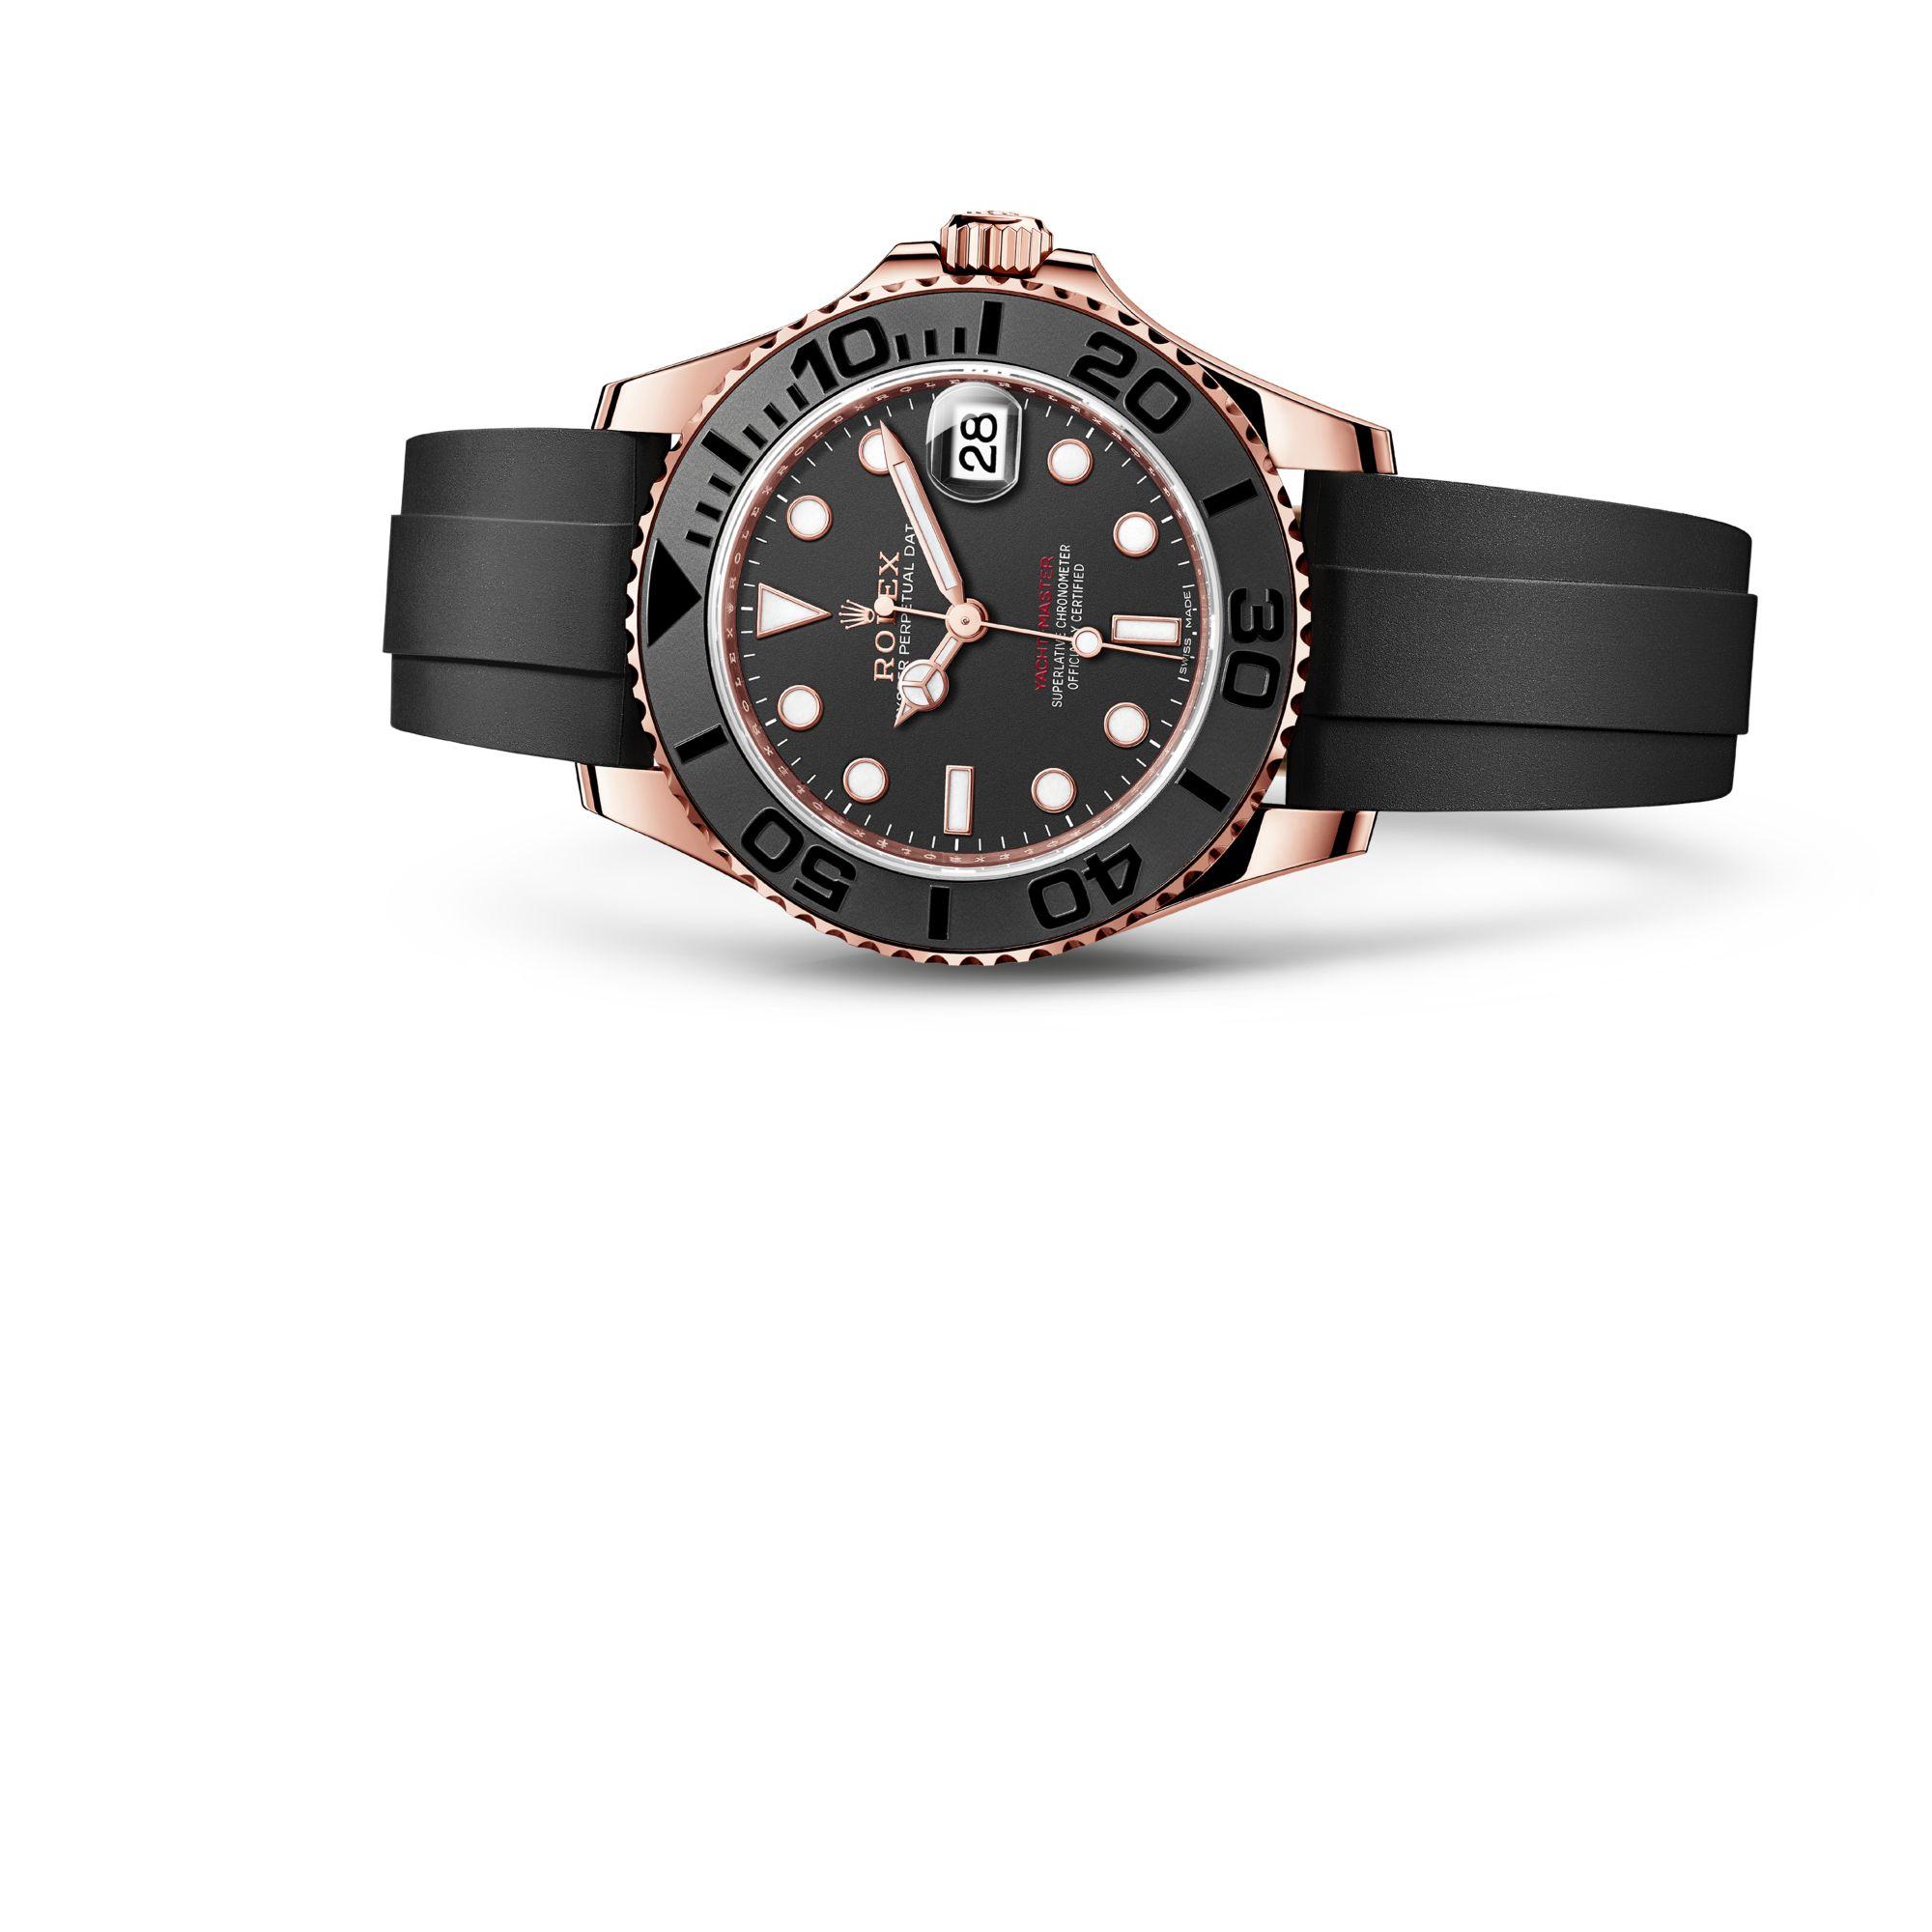 Rolex ヨットマスター 37 M268655-0002